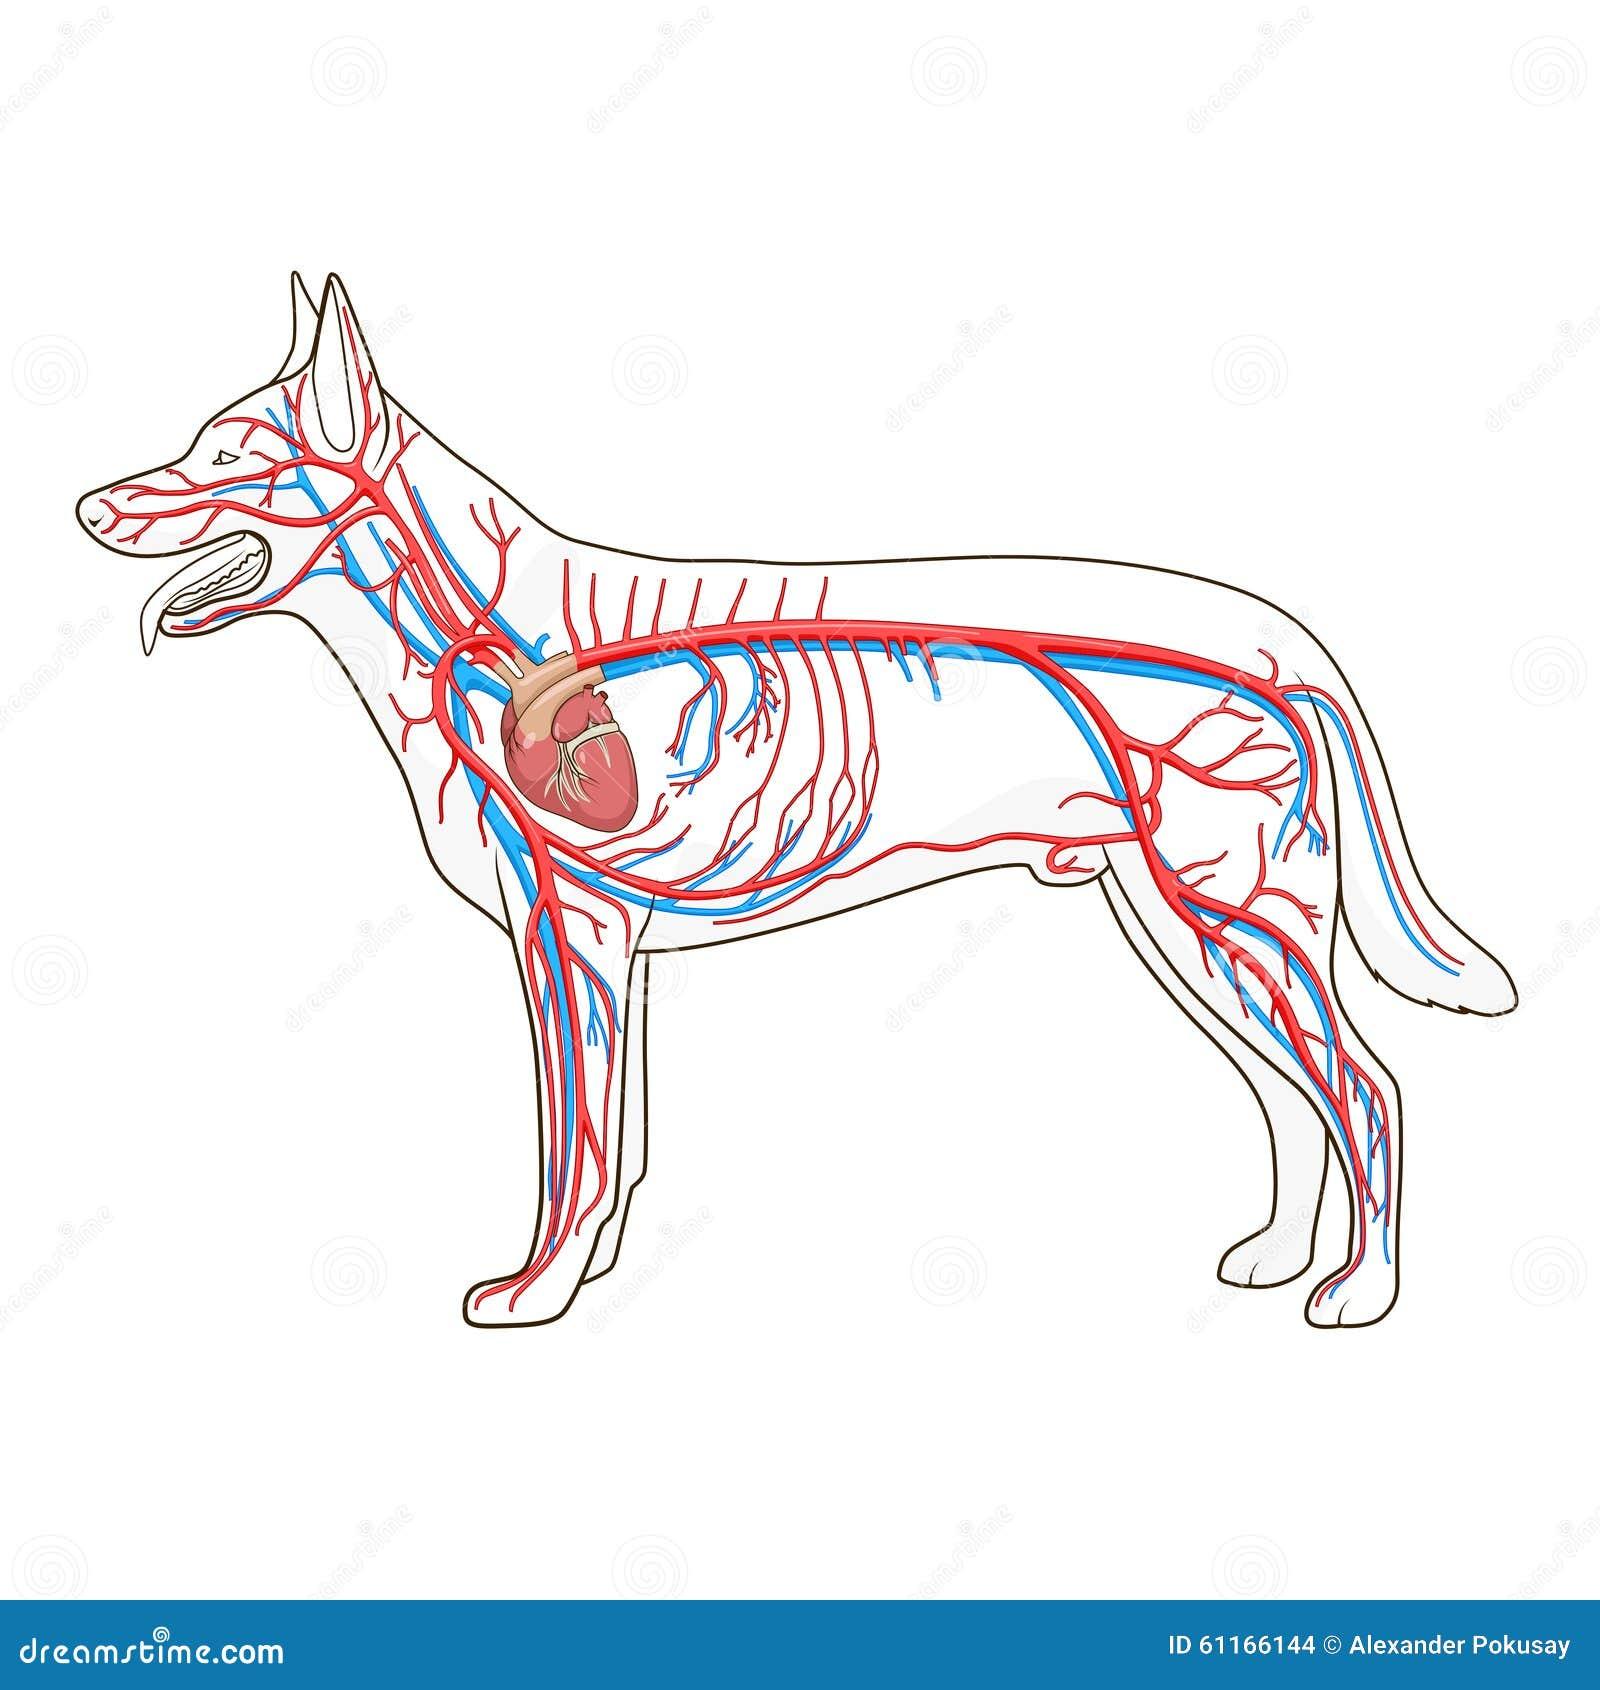 Circulatory System Diagram Dog And Cat - Circuit Connection Diagram •